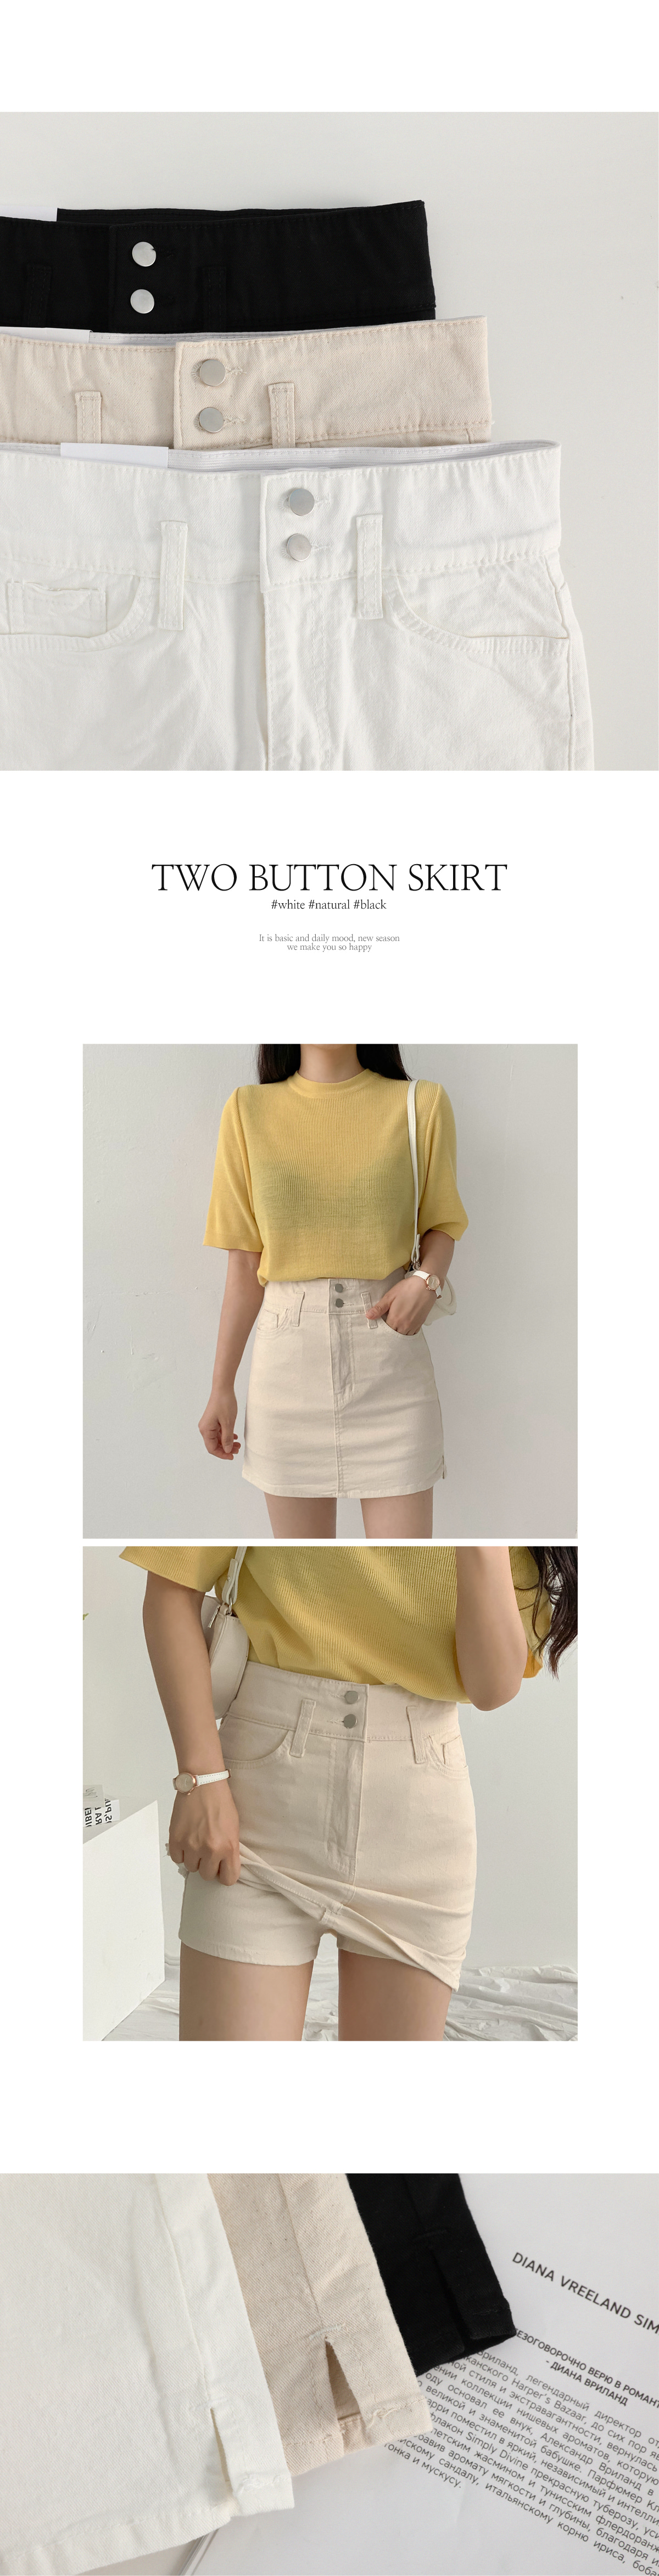 Double span skirt